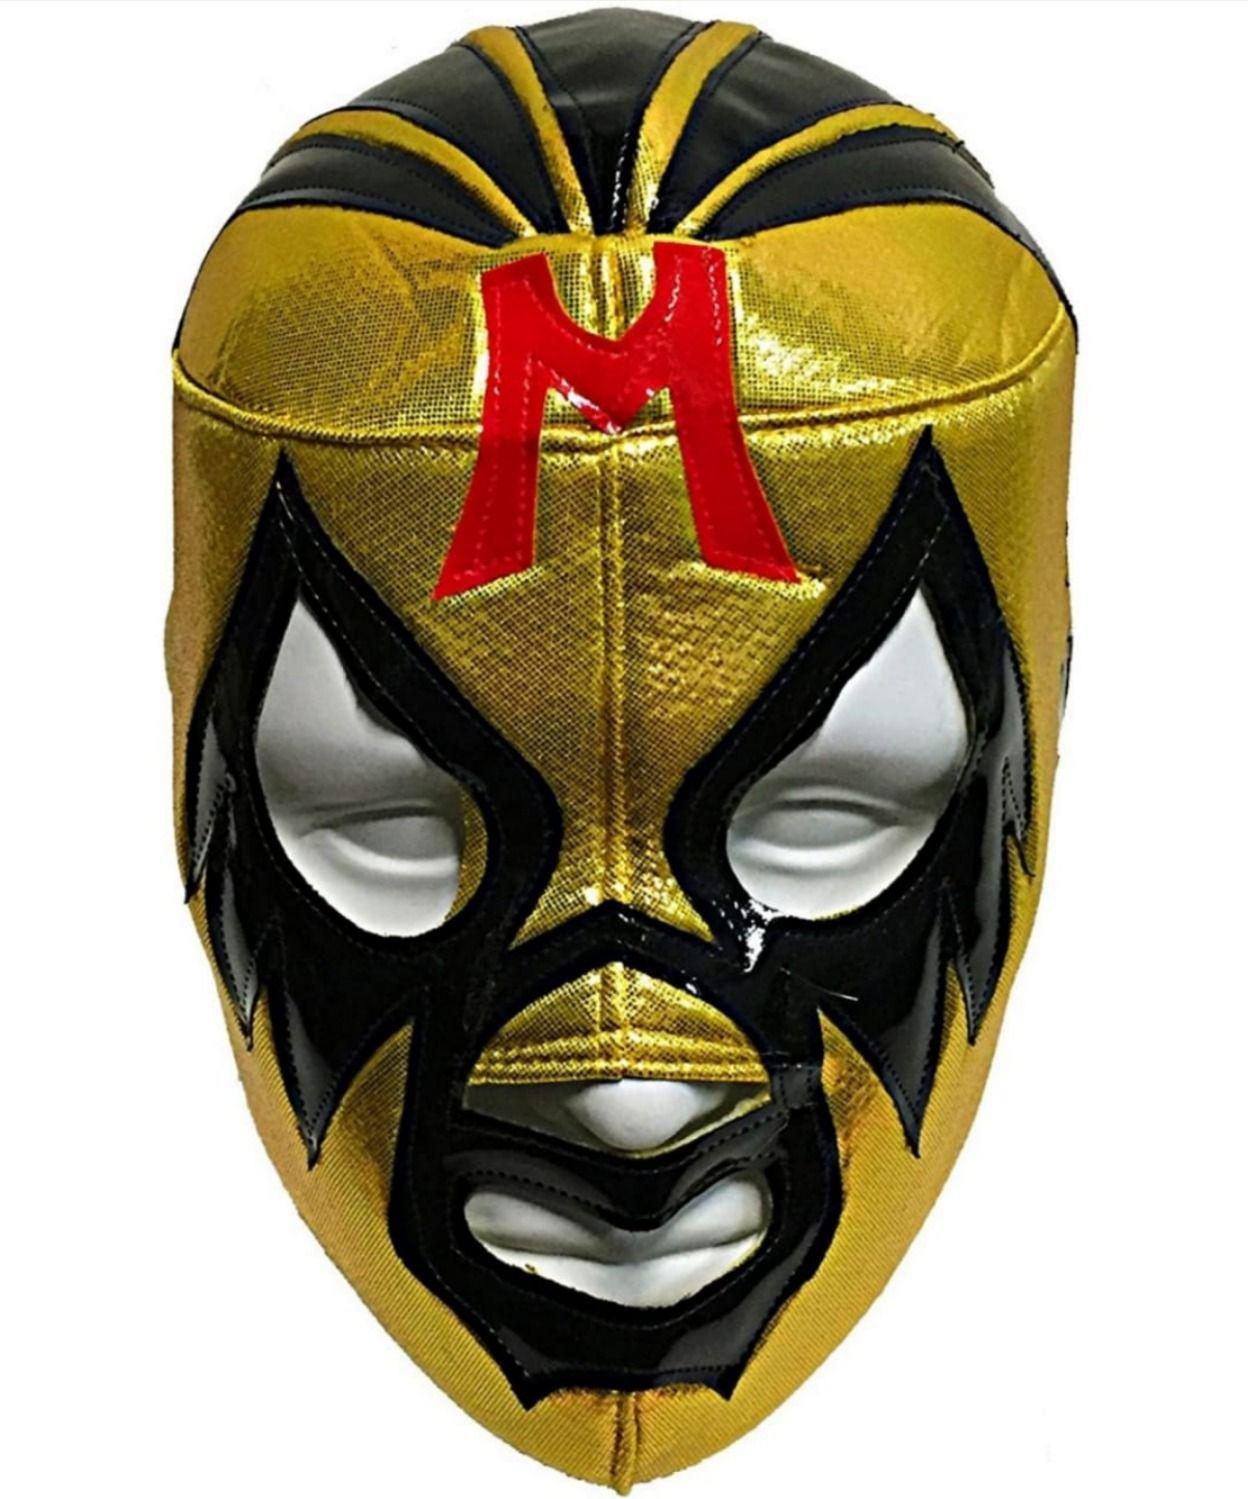 #LuchadorMaskAdult #luchalibreMask #luchadorKidMask#WrestlingMaskForMen #WretslerMask #WrestlerGift #WrestlingMan #LuchaLibreMexicana #LuchadoresMexicanos #LuchaLibreMexicanaMascaras #Wrestling #LuchaLibre #Lucha #MexicanCostume #MexicanParty #MexicanWrestling #MilMascaras  #CostumeMilMascaras #MexicanMask  #MaskMilMascaras ⬆️You can buy HERE  ⬆️